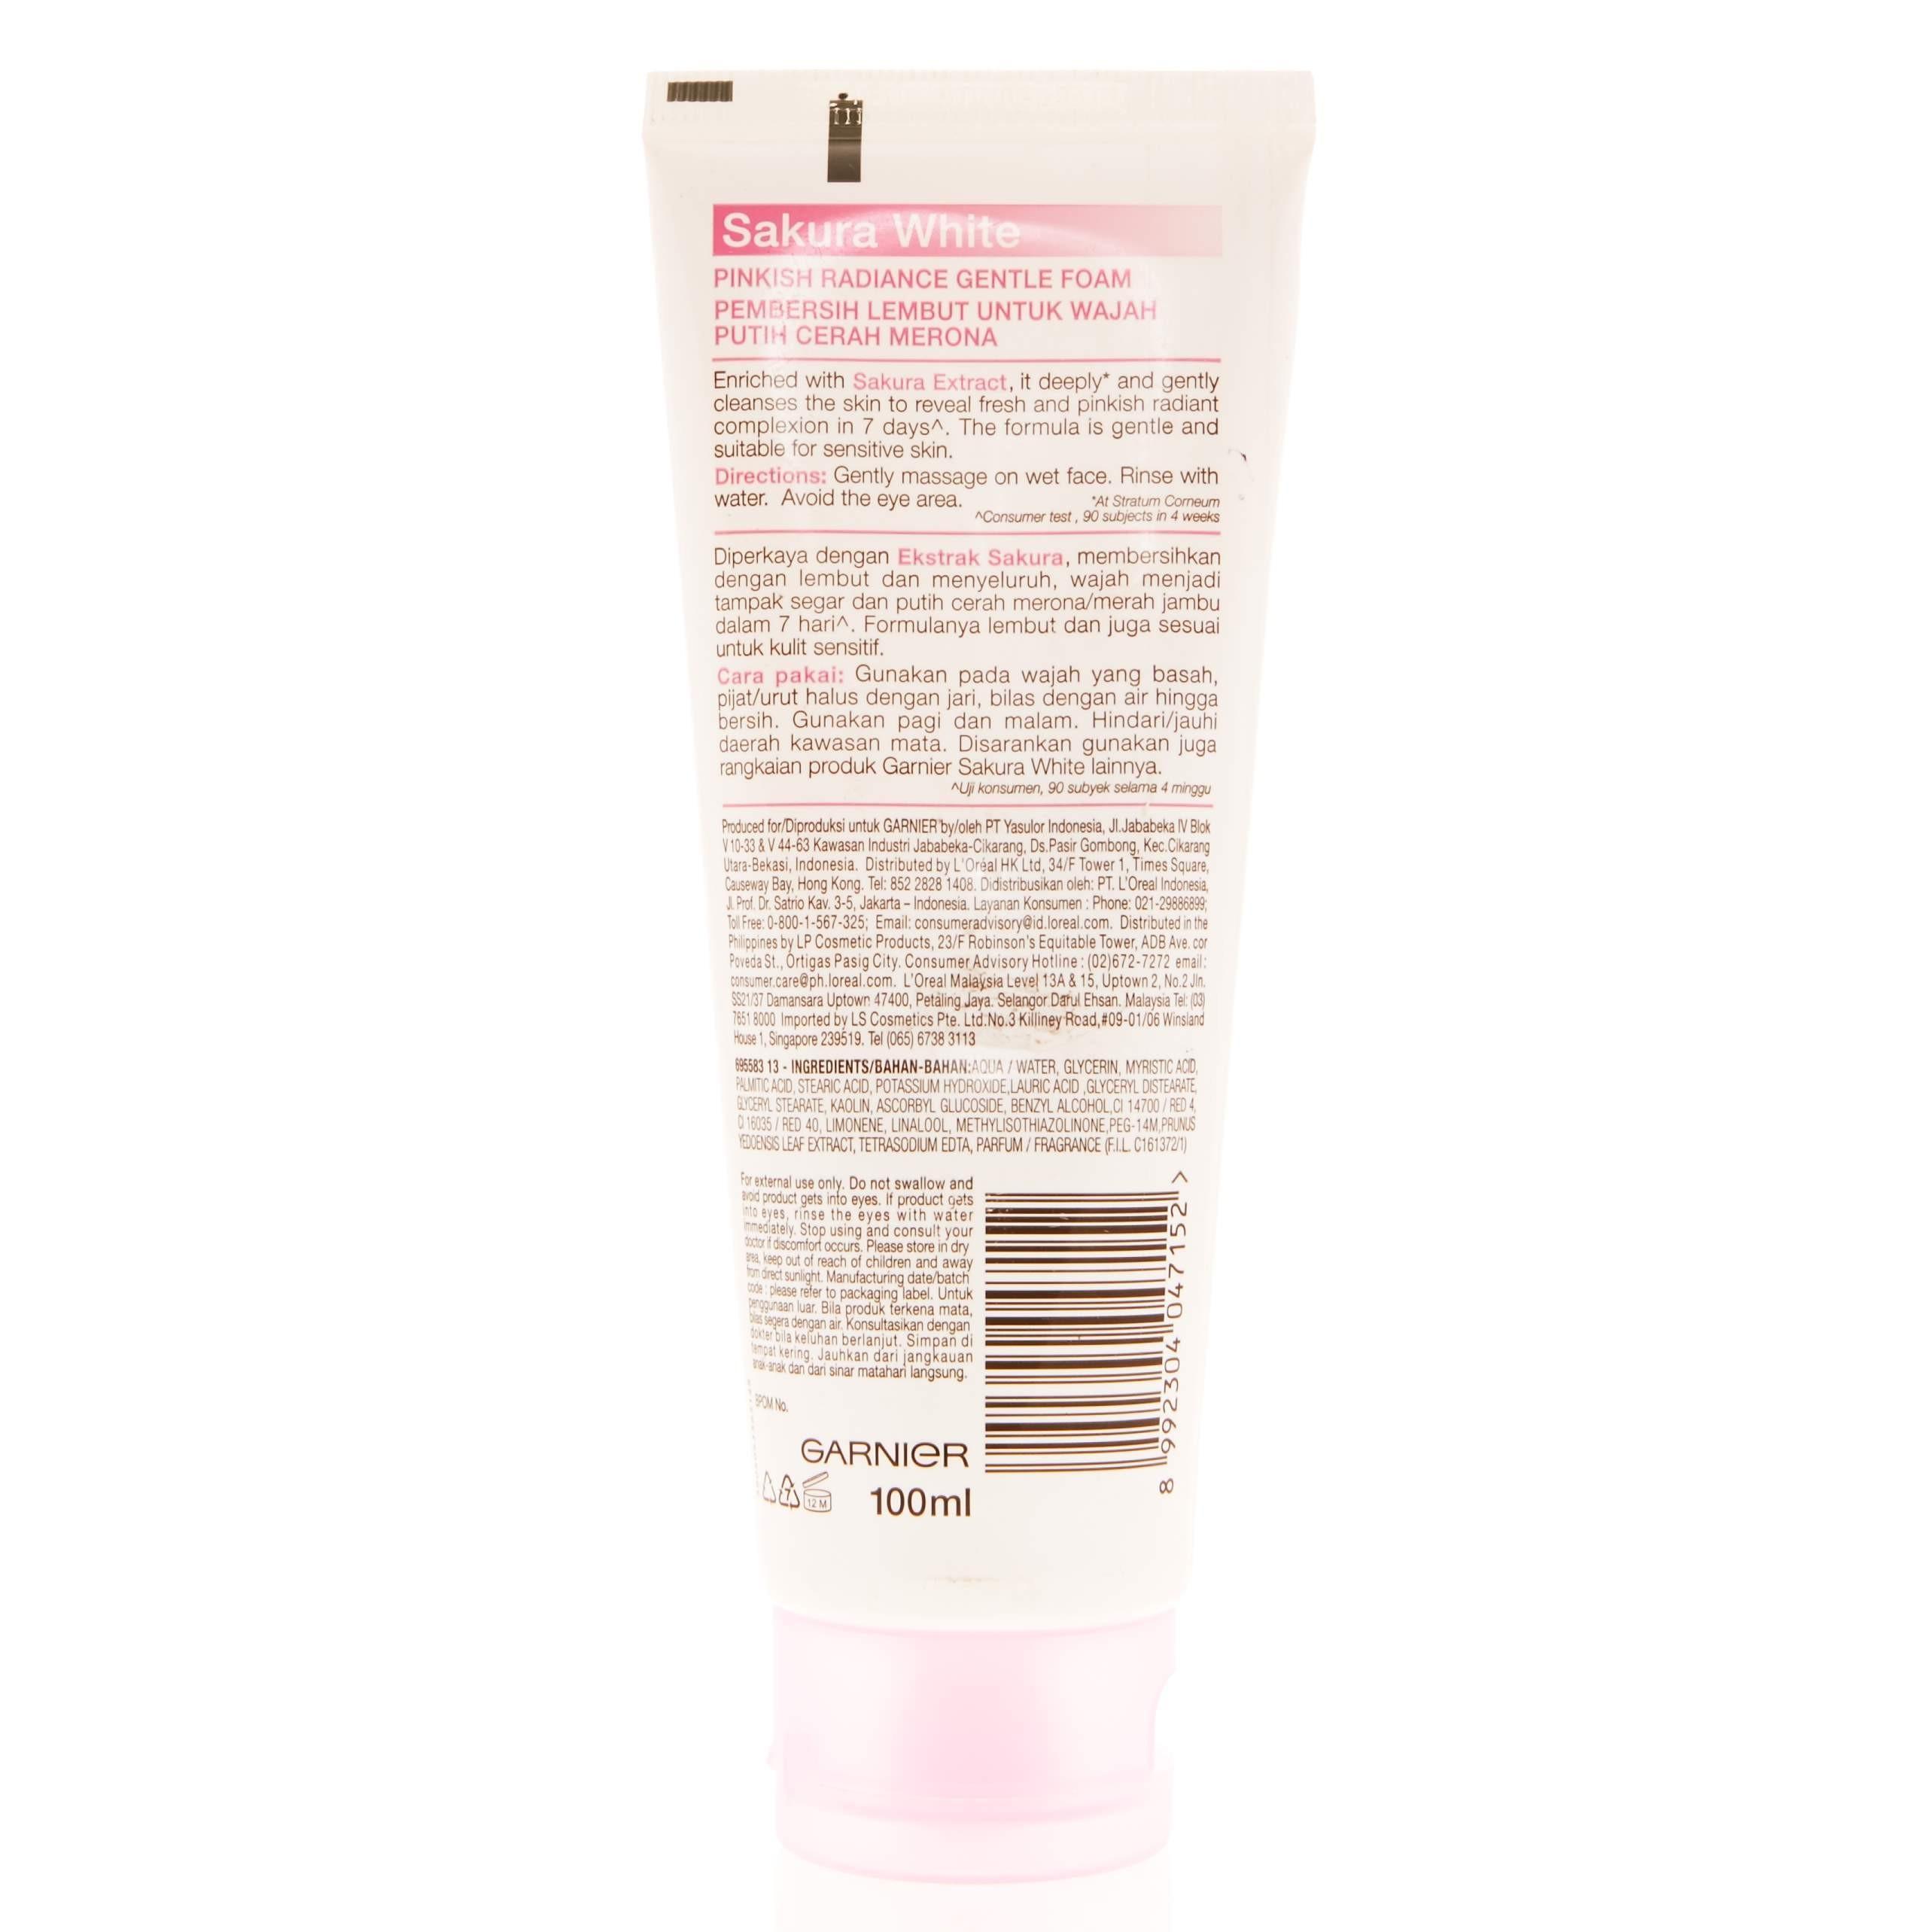 ... GARNIER Facial Foam Sakura White 100ml - 3